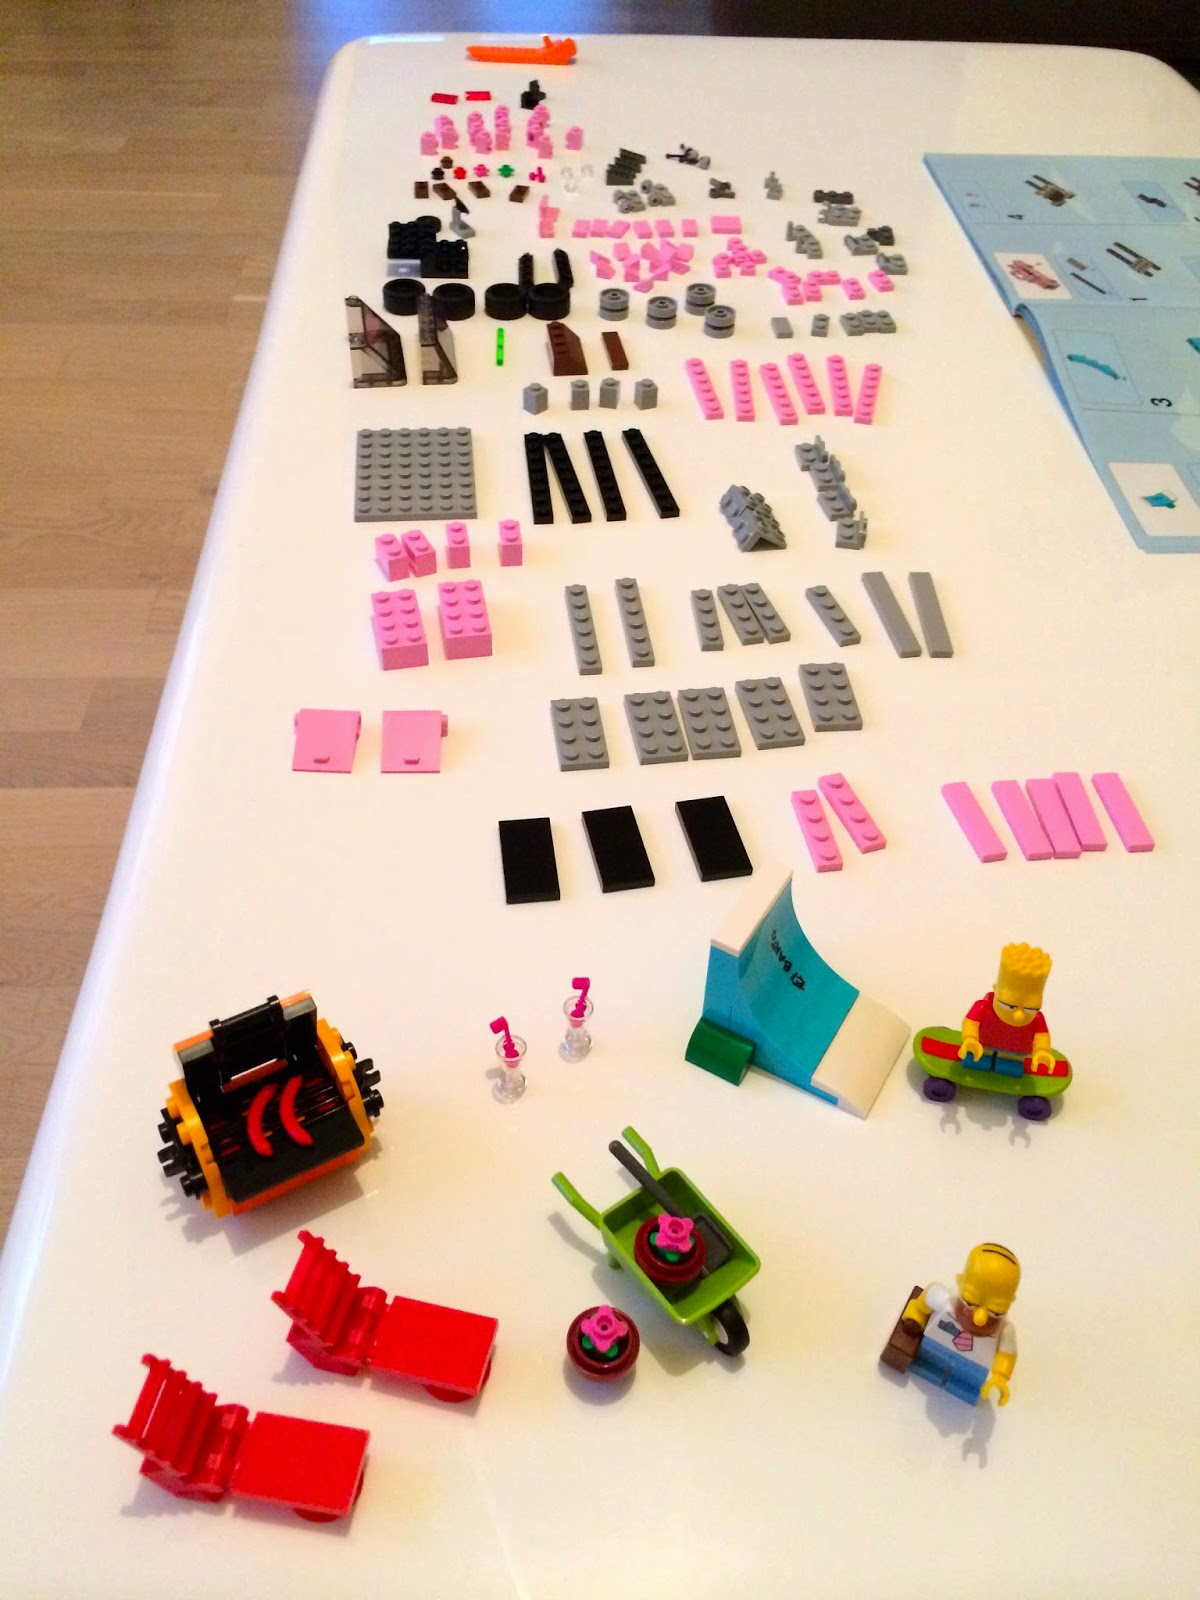 spawnzon blog mein lego simpsons haus aufbau teil 1. Black Bedroom Furniture Sets. Home Design Ideas